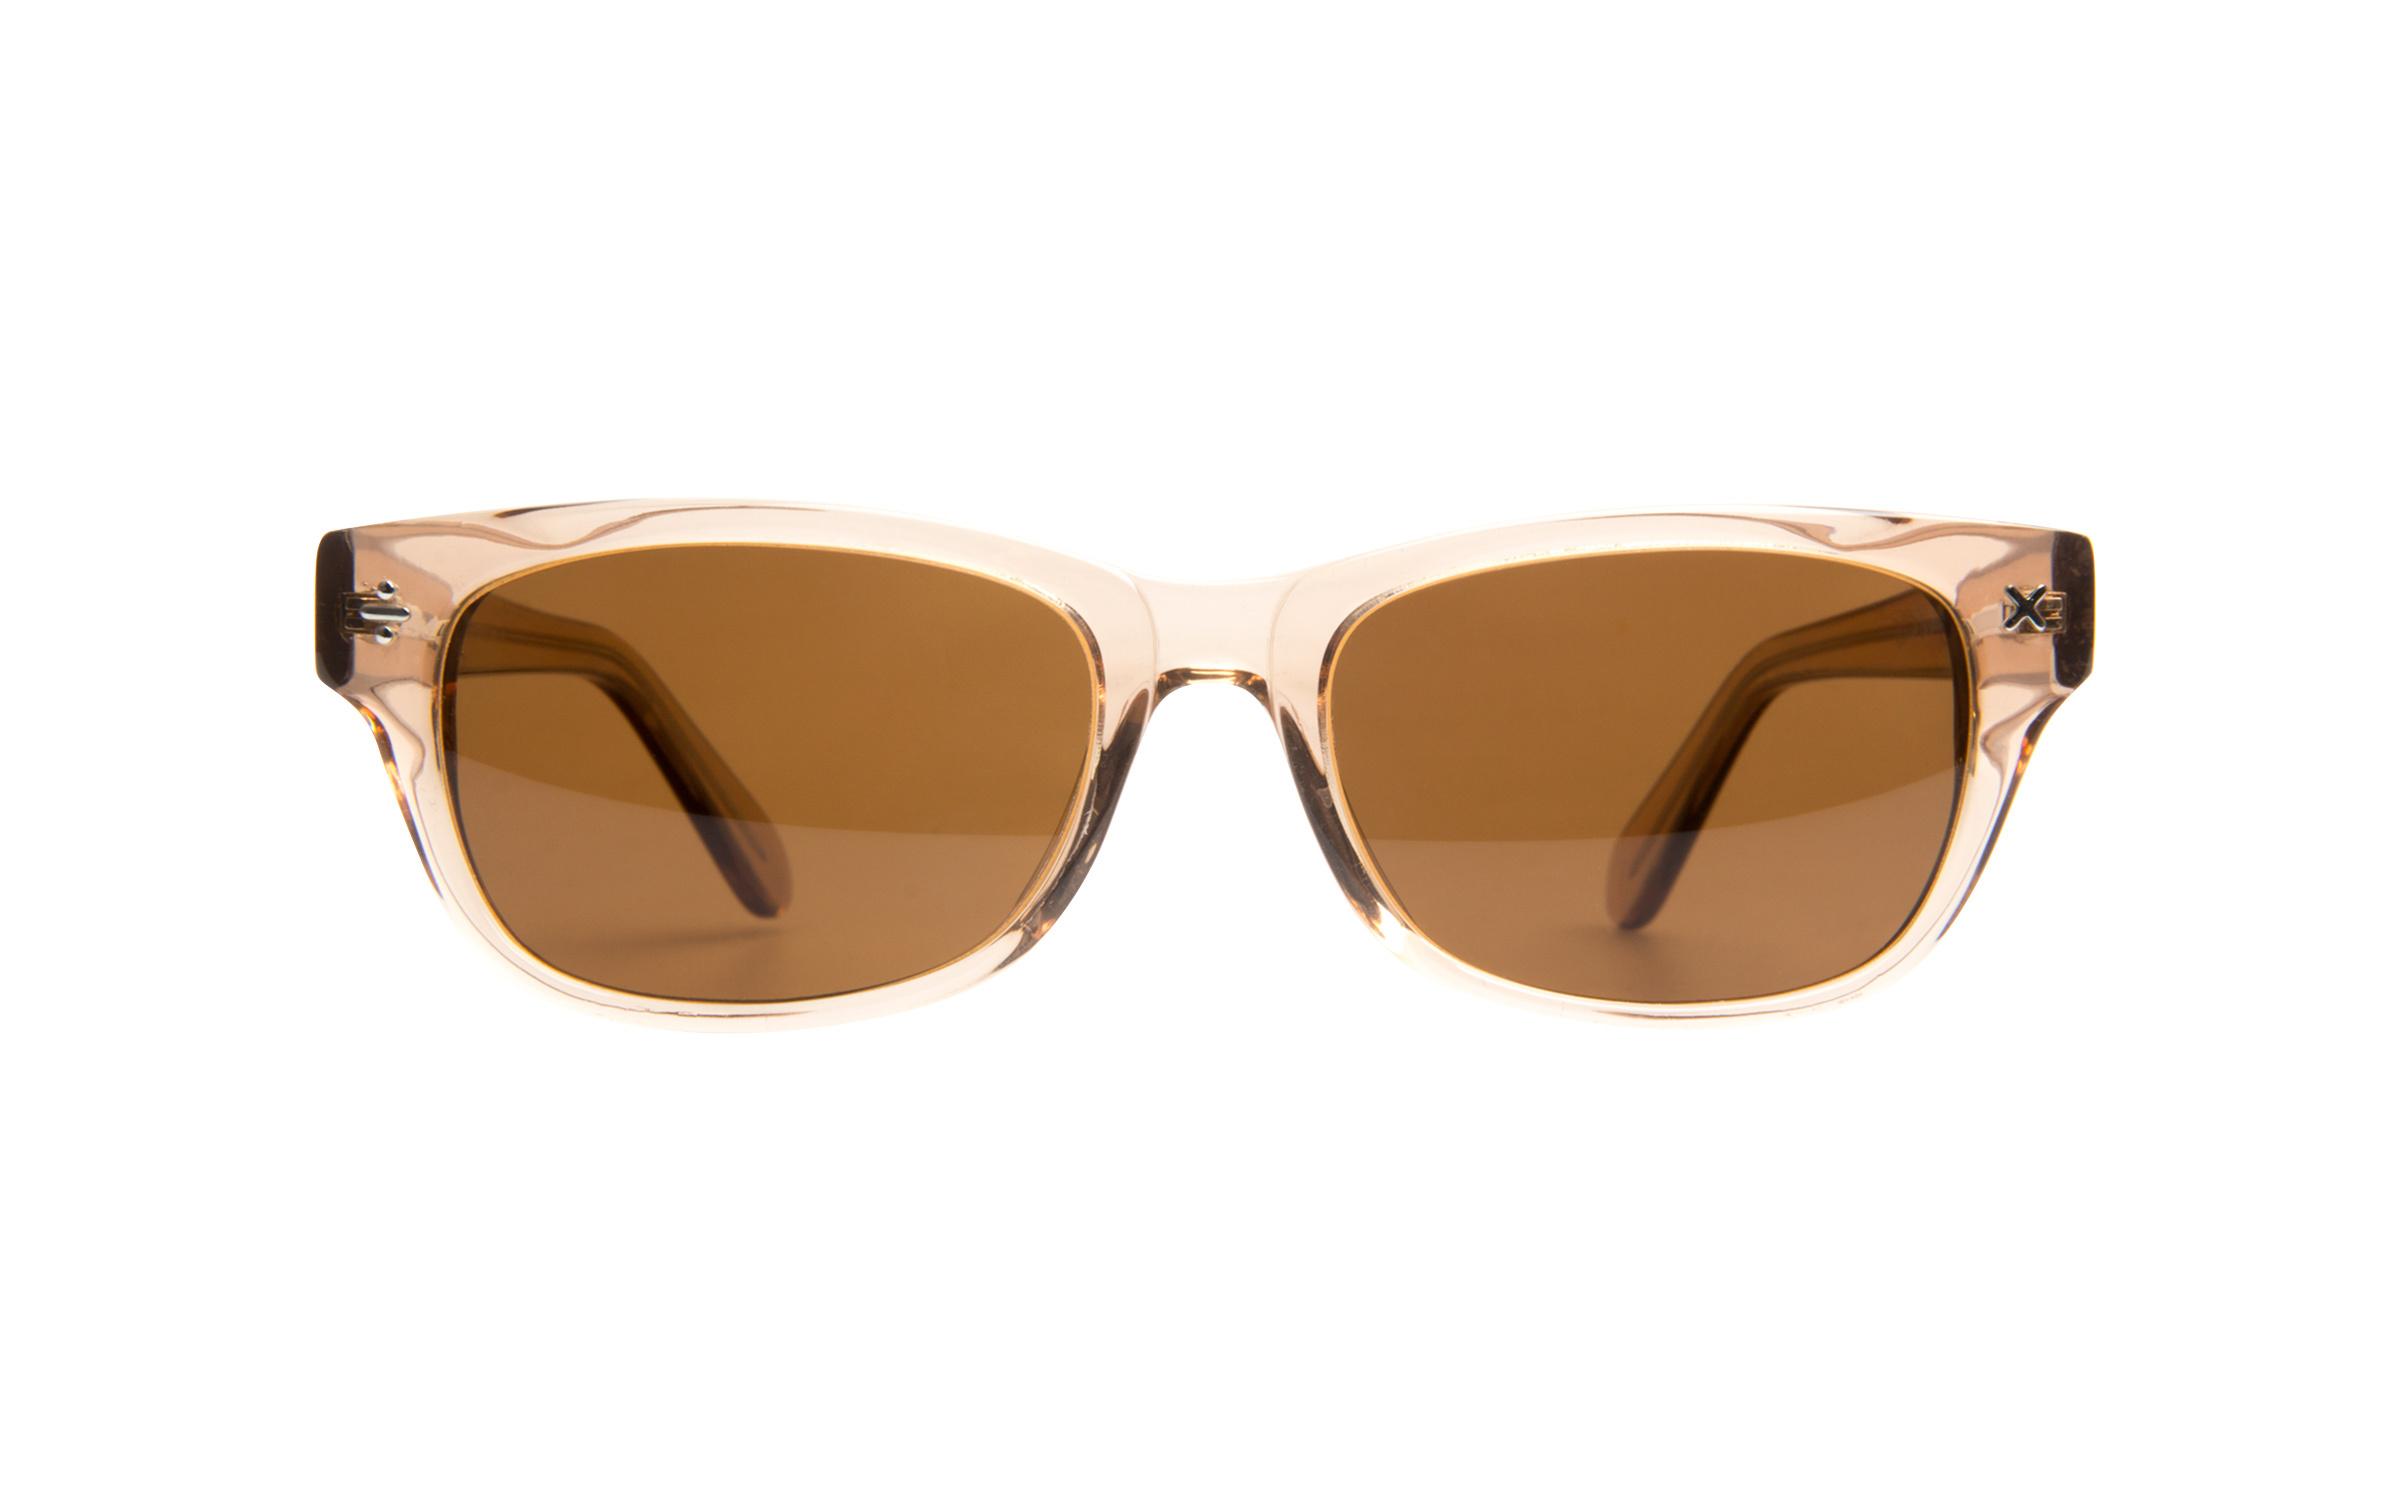 Brown_Retro_Derek_Cardigan_Sunglasses__Clearly_Glasses_Online